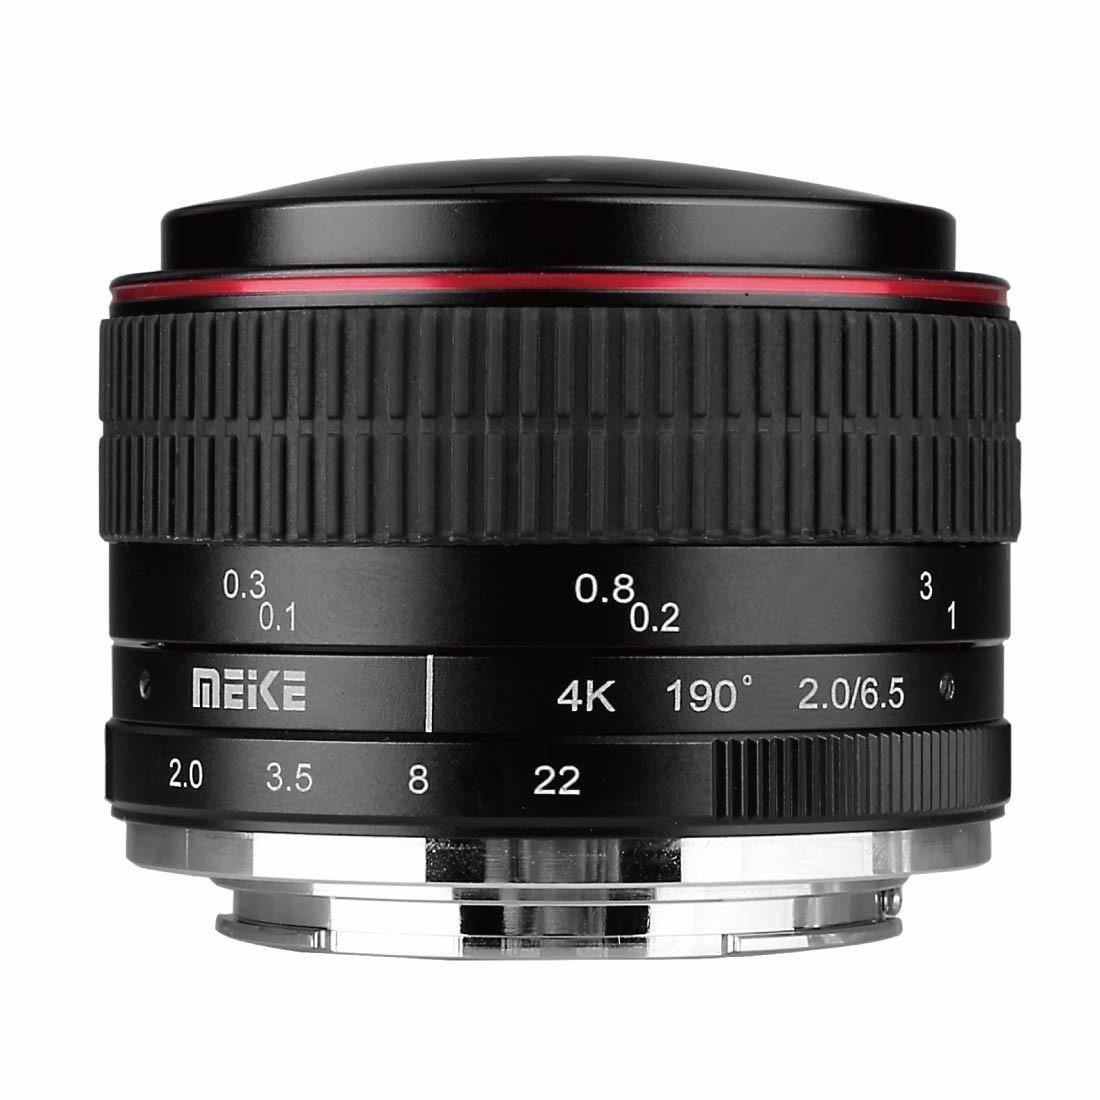 MEIKE MK 6 5mm F2 0 Fisheye Lens for Panasonic Olympus Mirrorless MFT M4 3 Lens